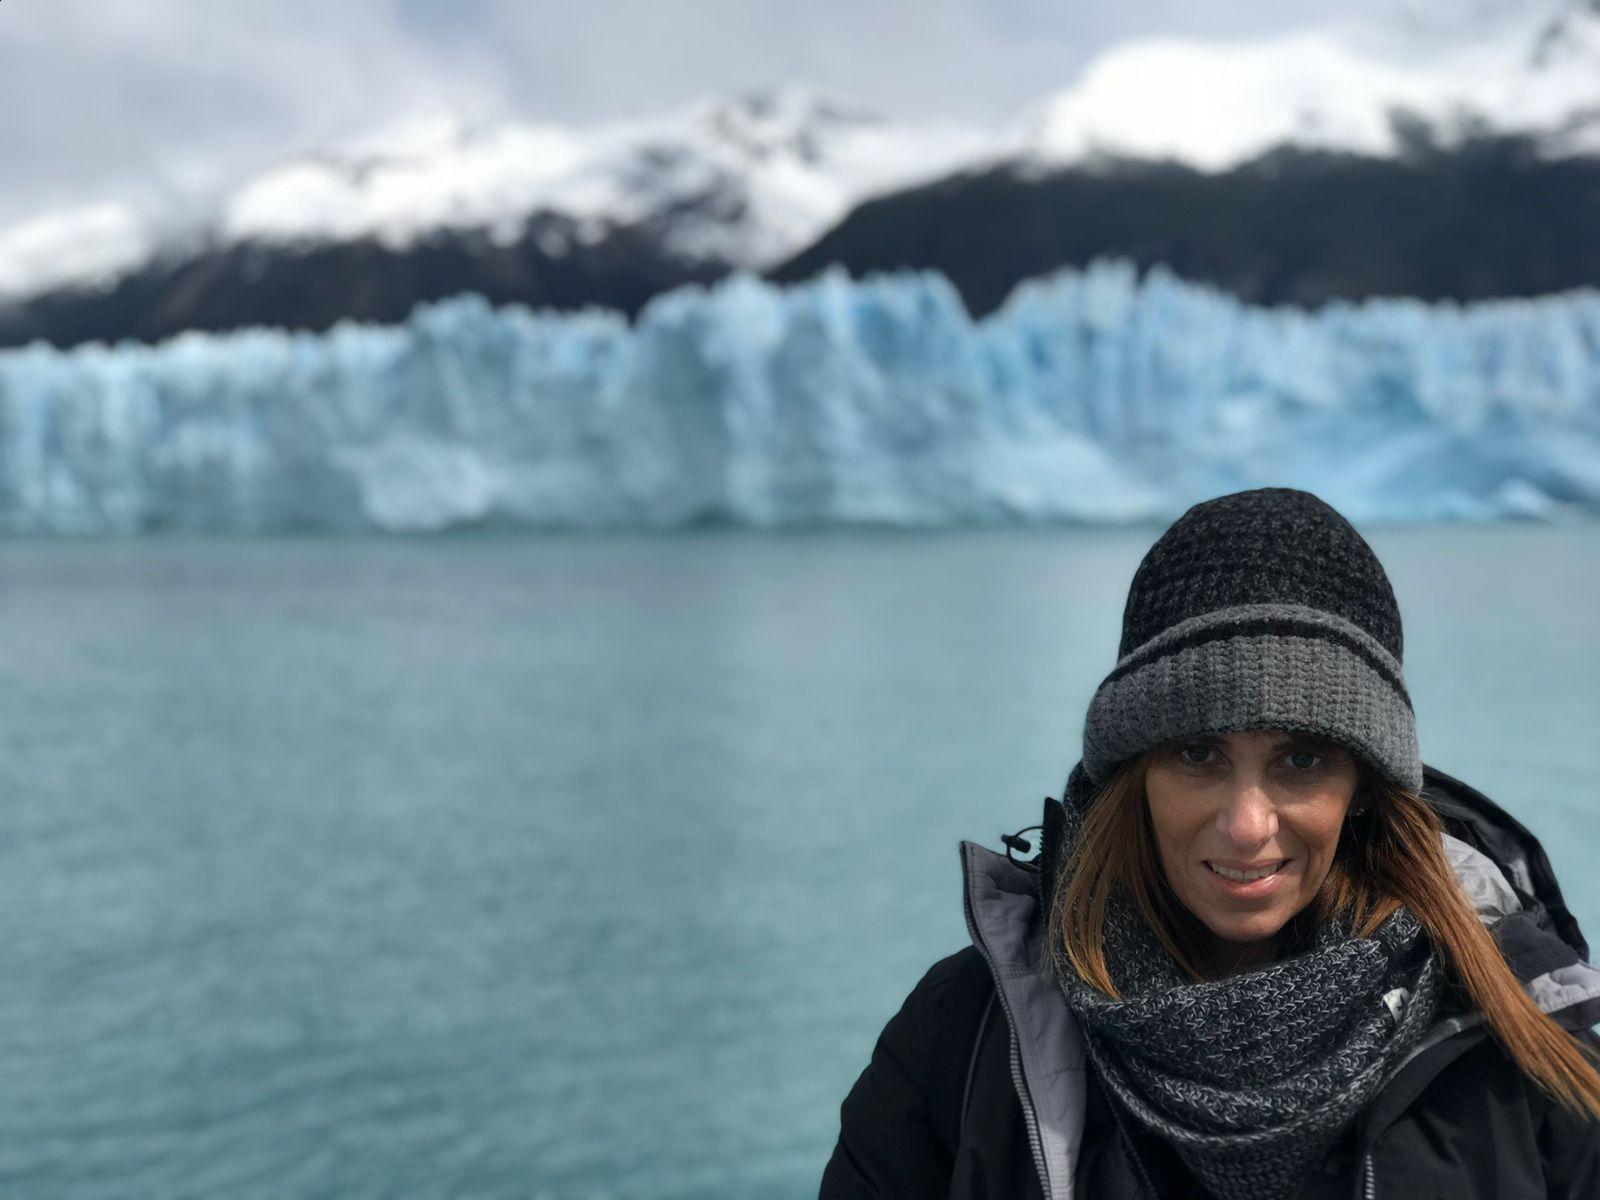 Glaciar Perito Moreno en Argentina. Foto de Ivonne Frid.